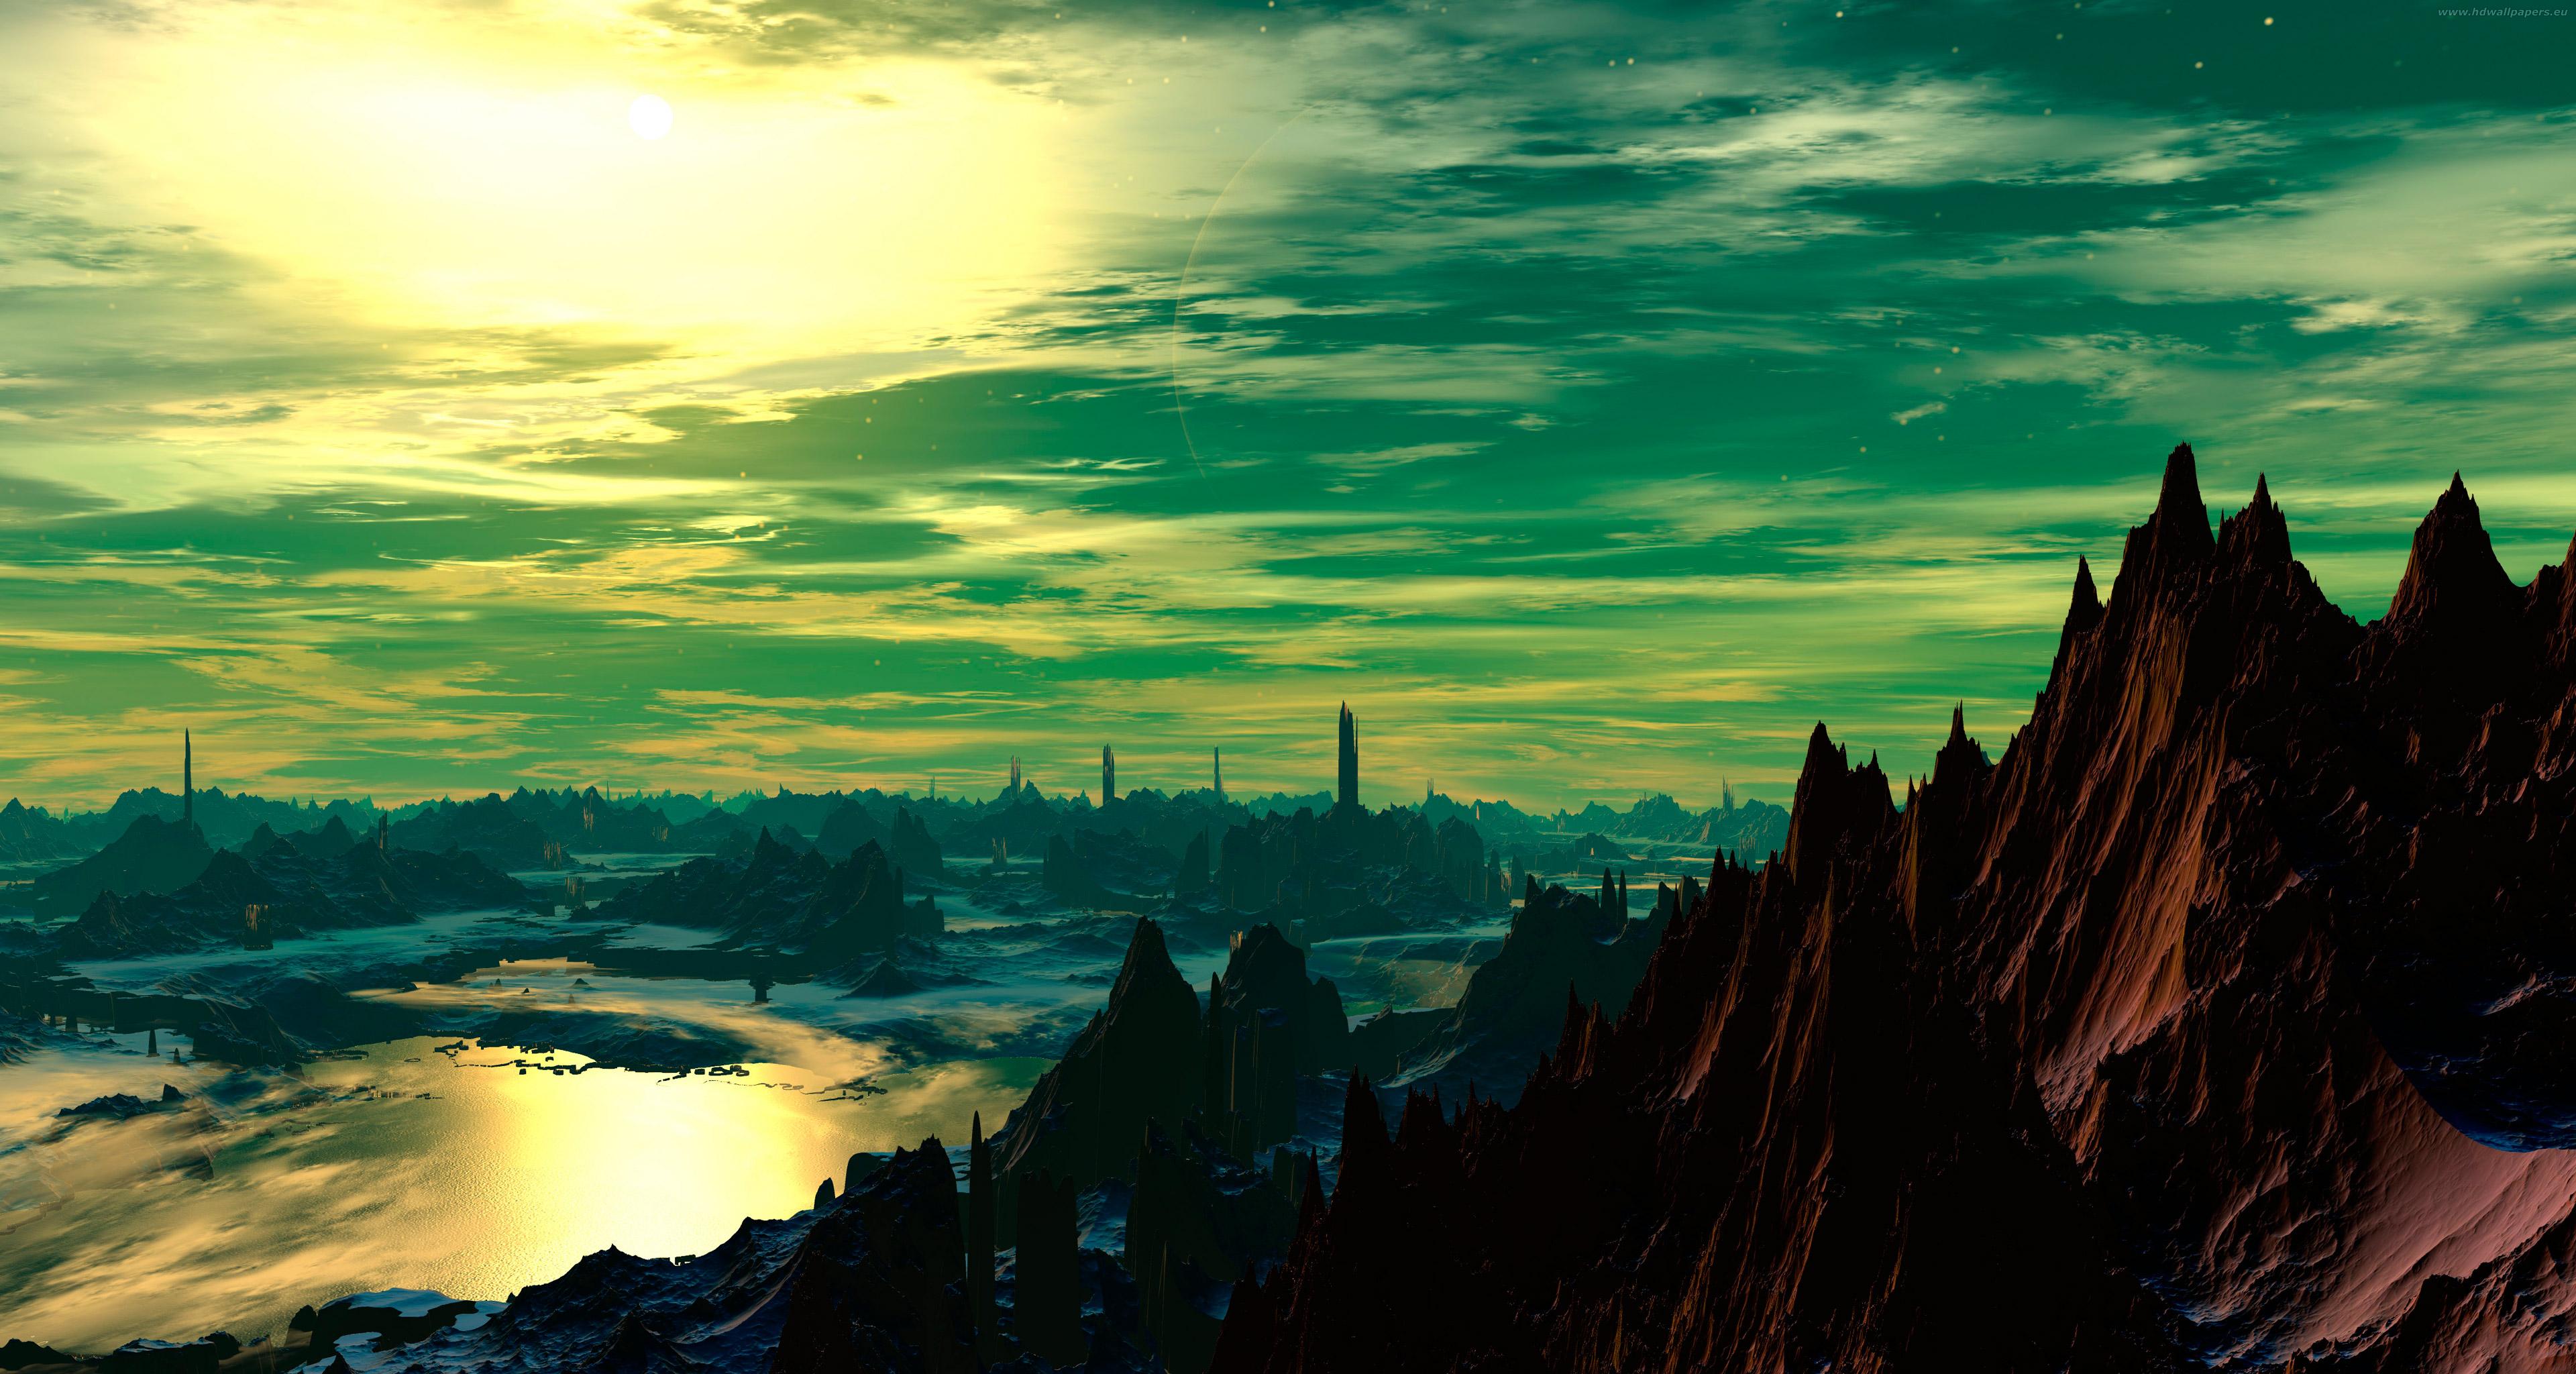 landscape ultrahd 3840x2048 3840x2048